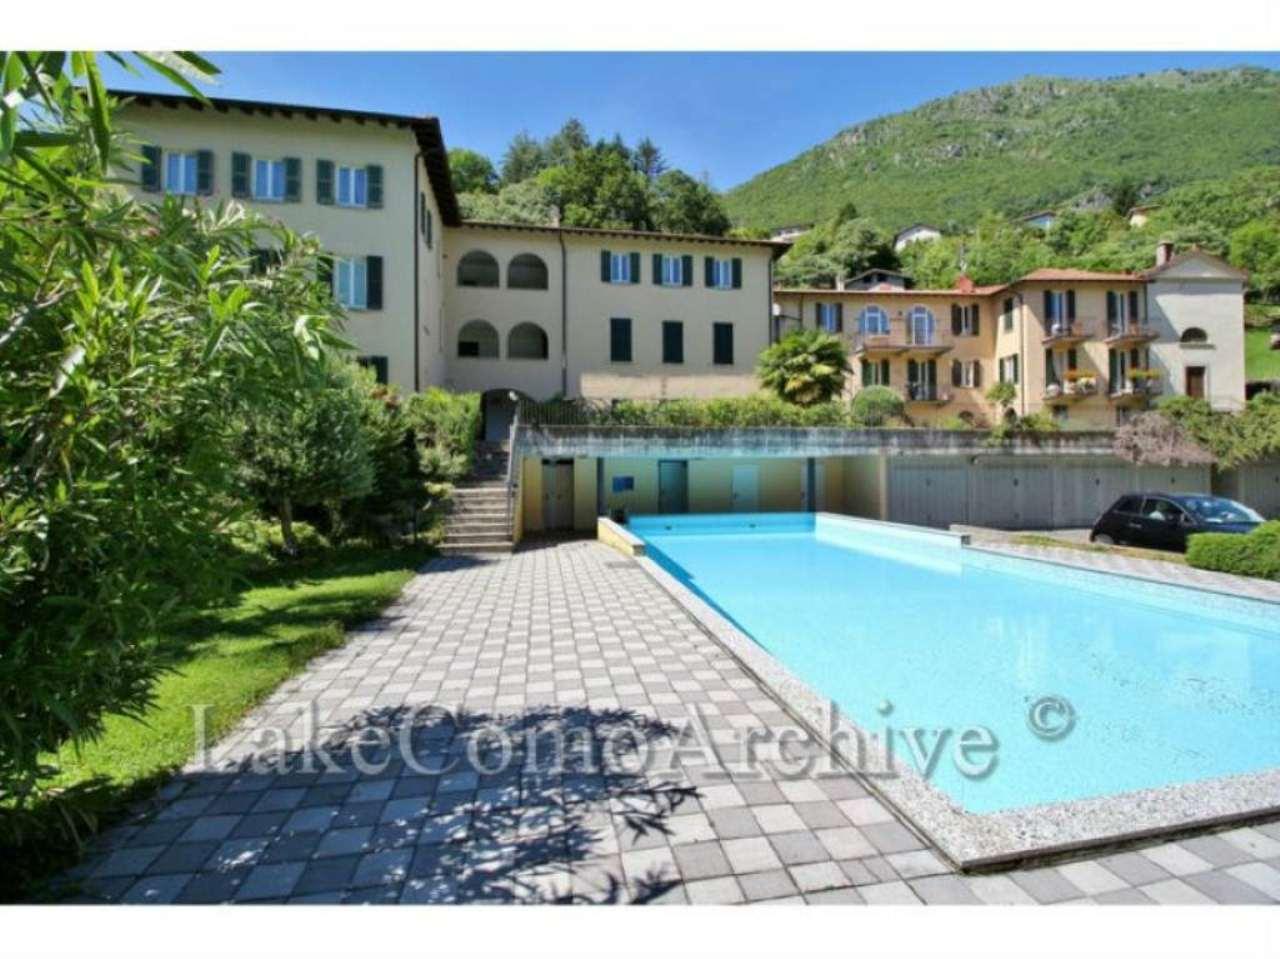 Villa Isella Giardino